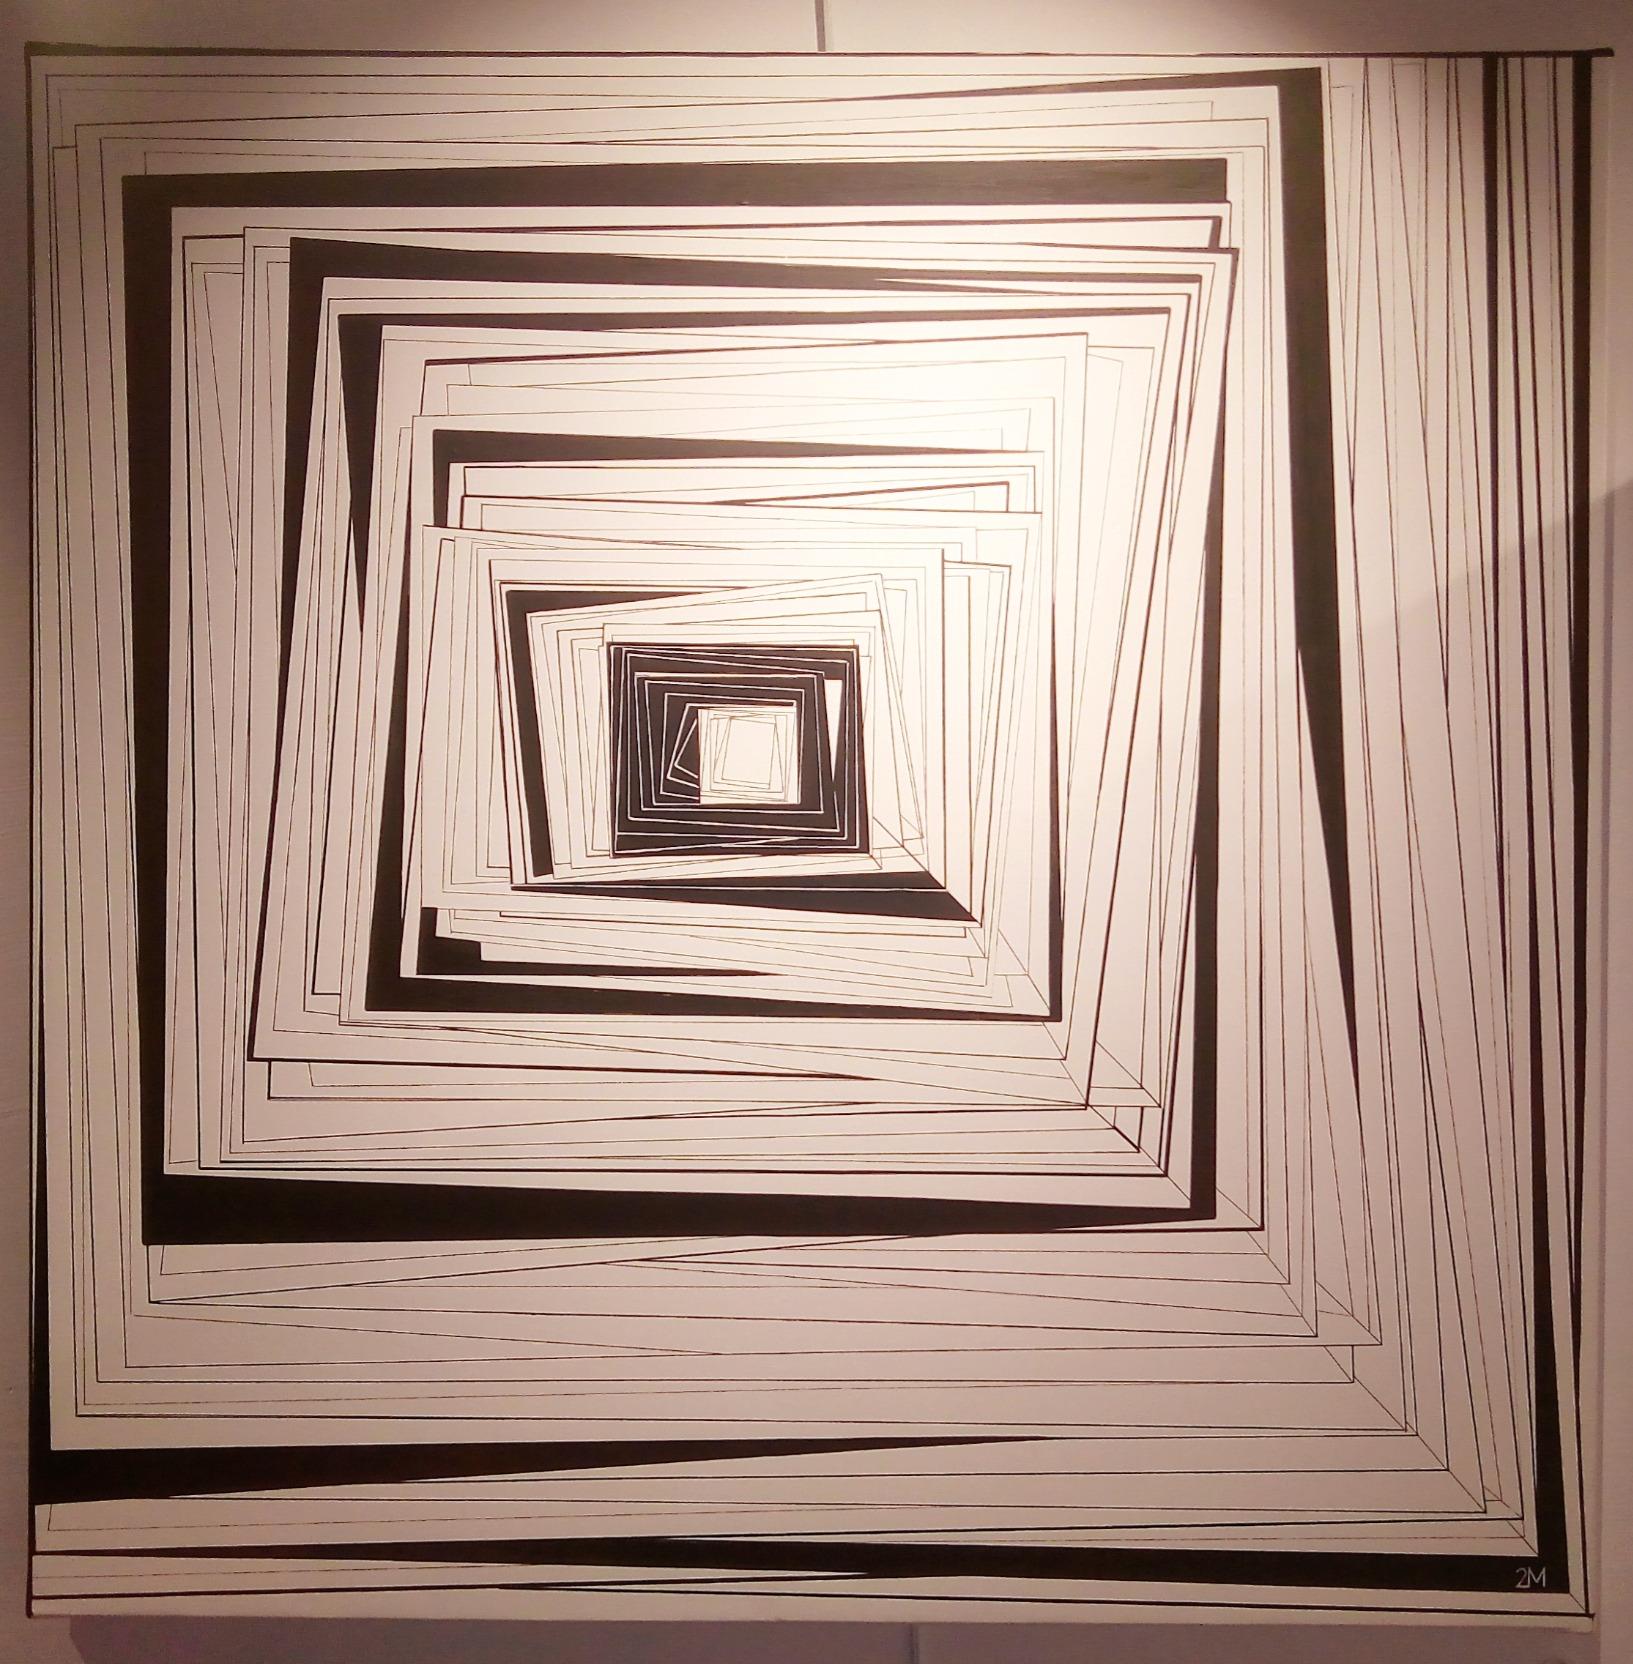 Intrication Noir et Blanc